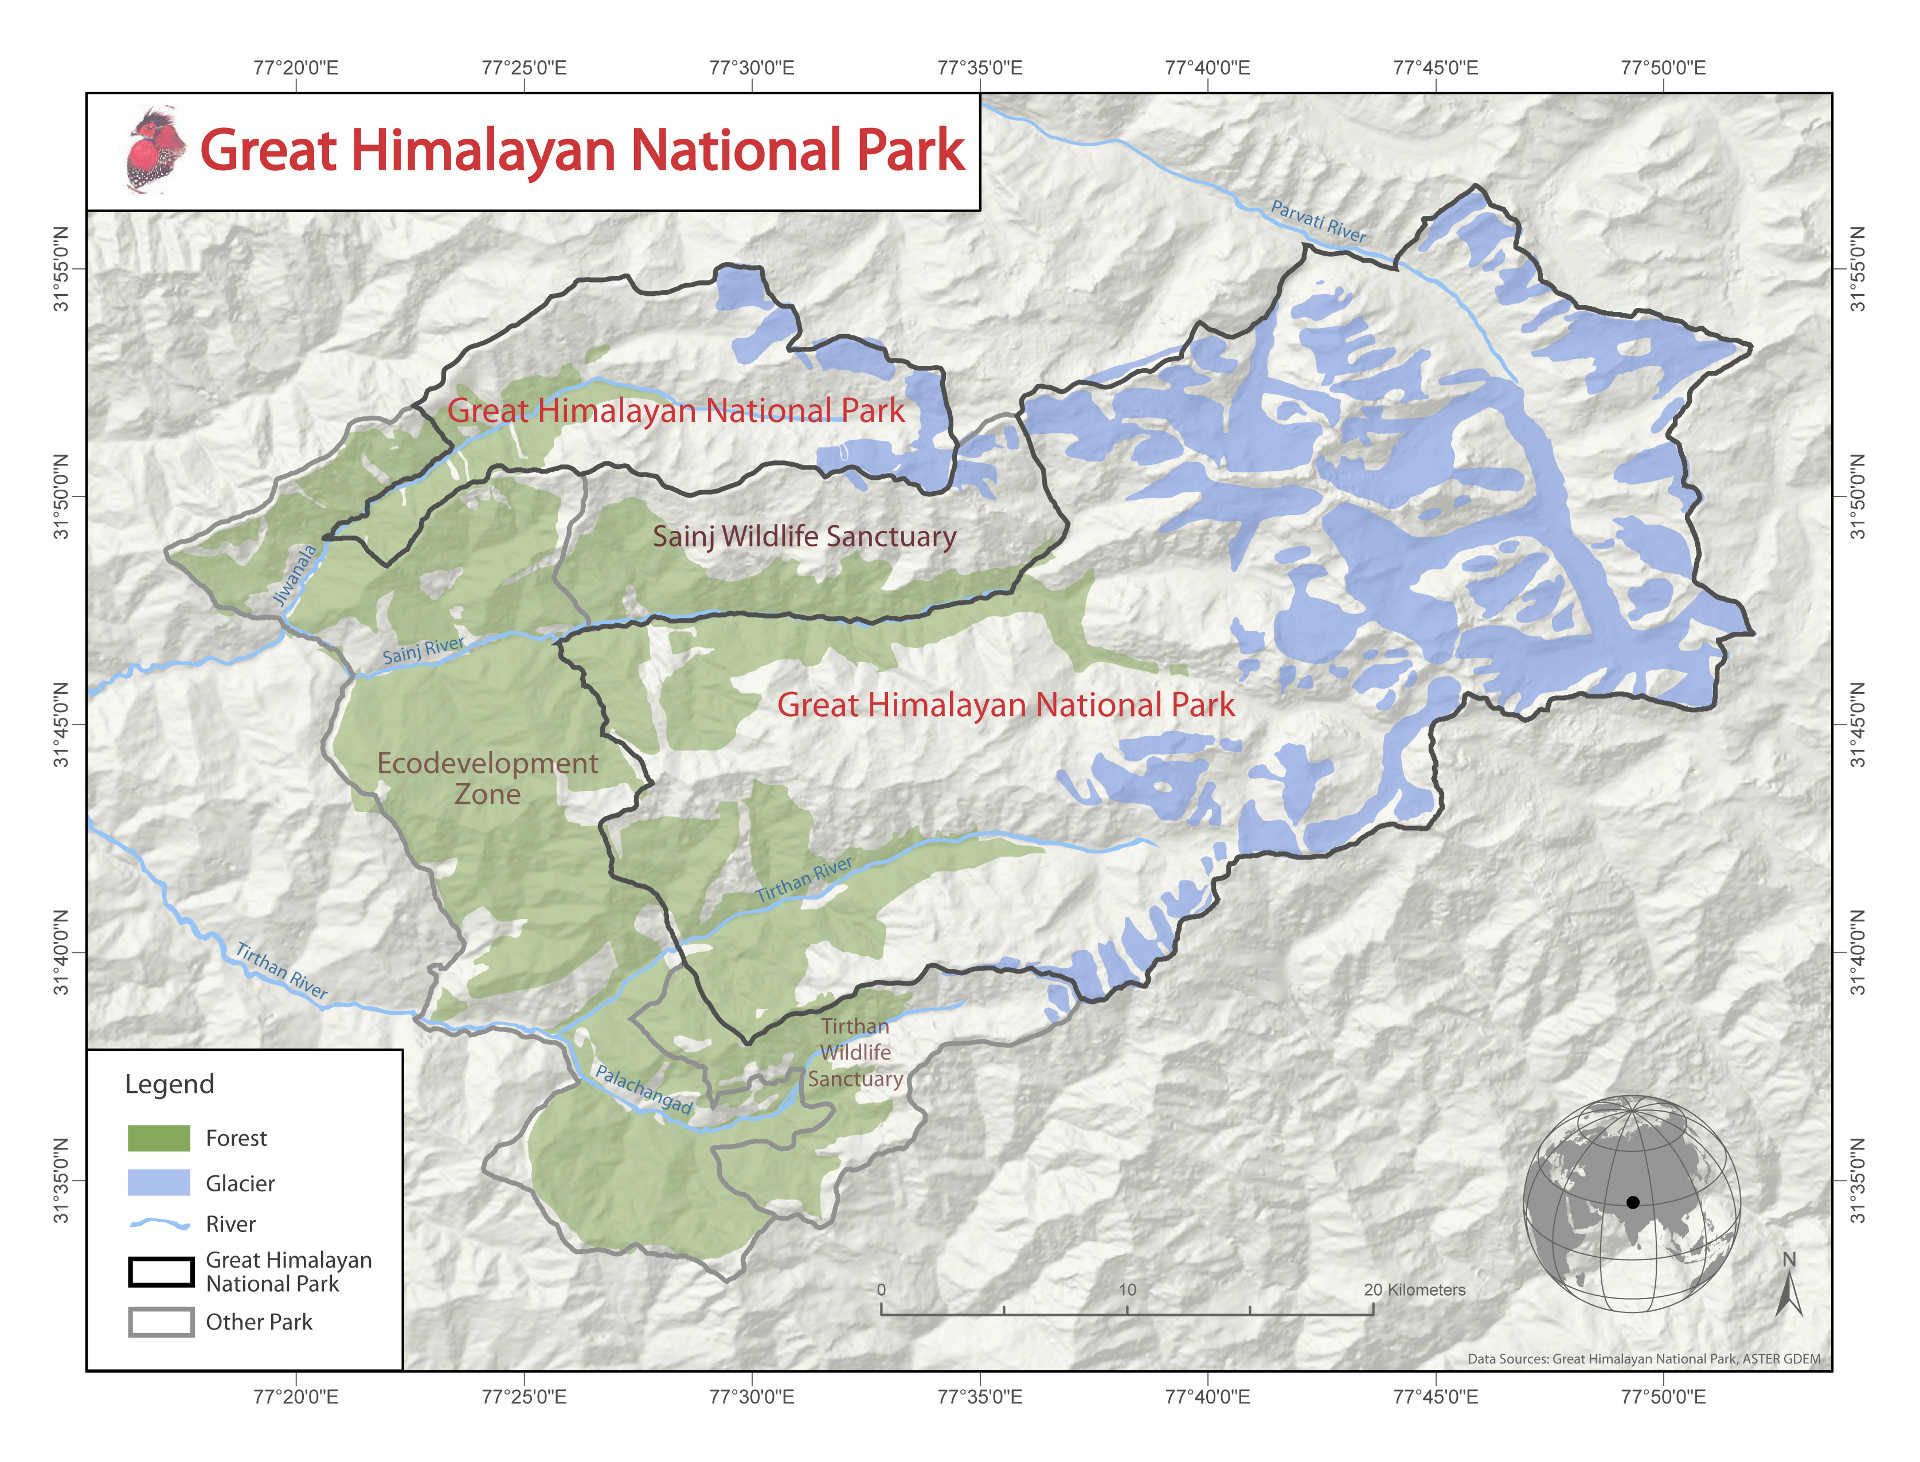 Asia: Great Himalayan National Park Conservation Area, India